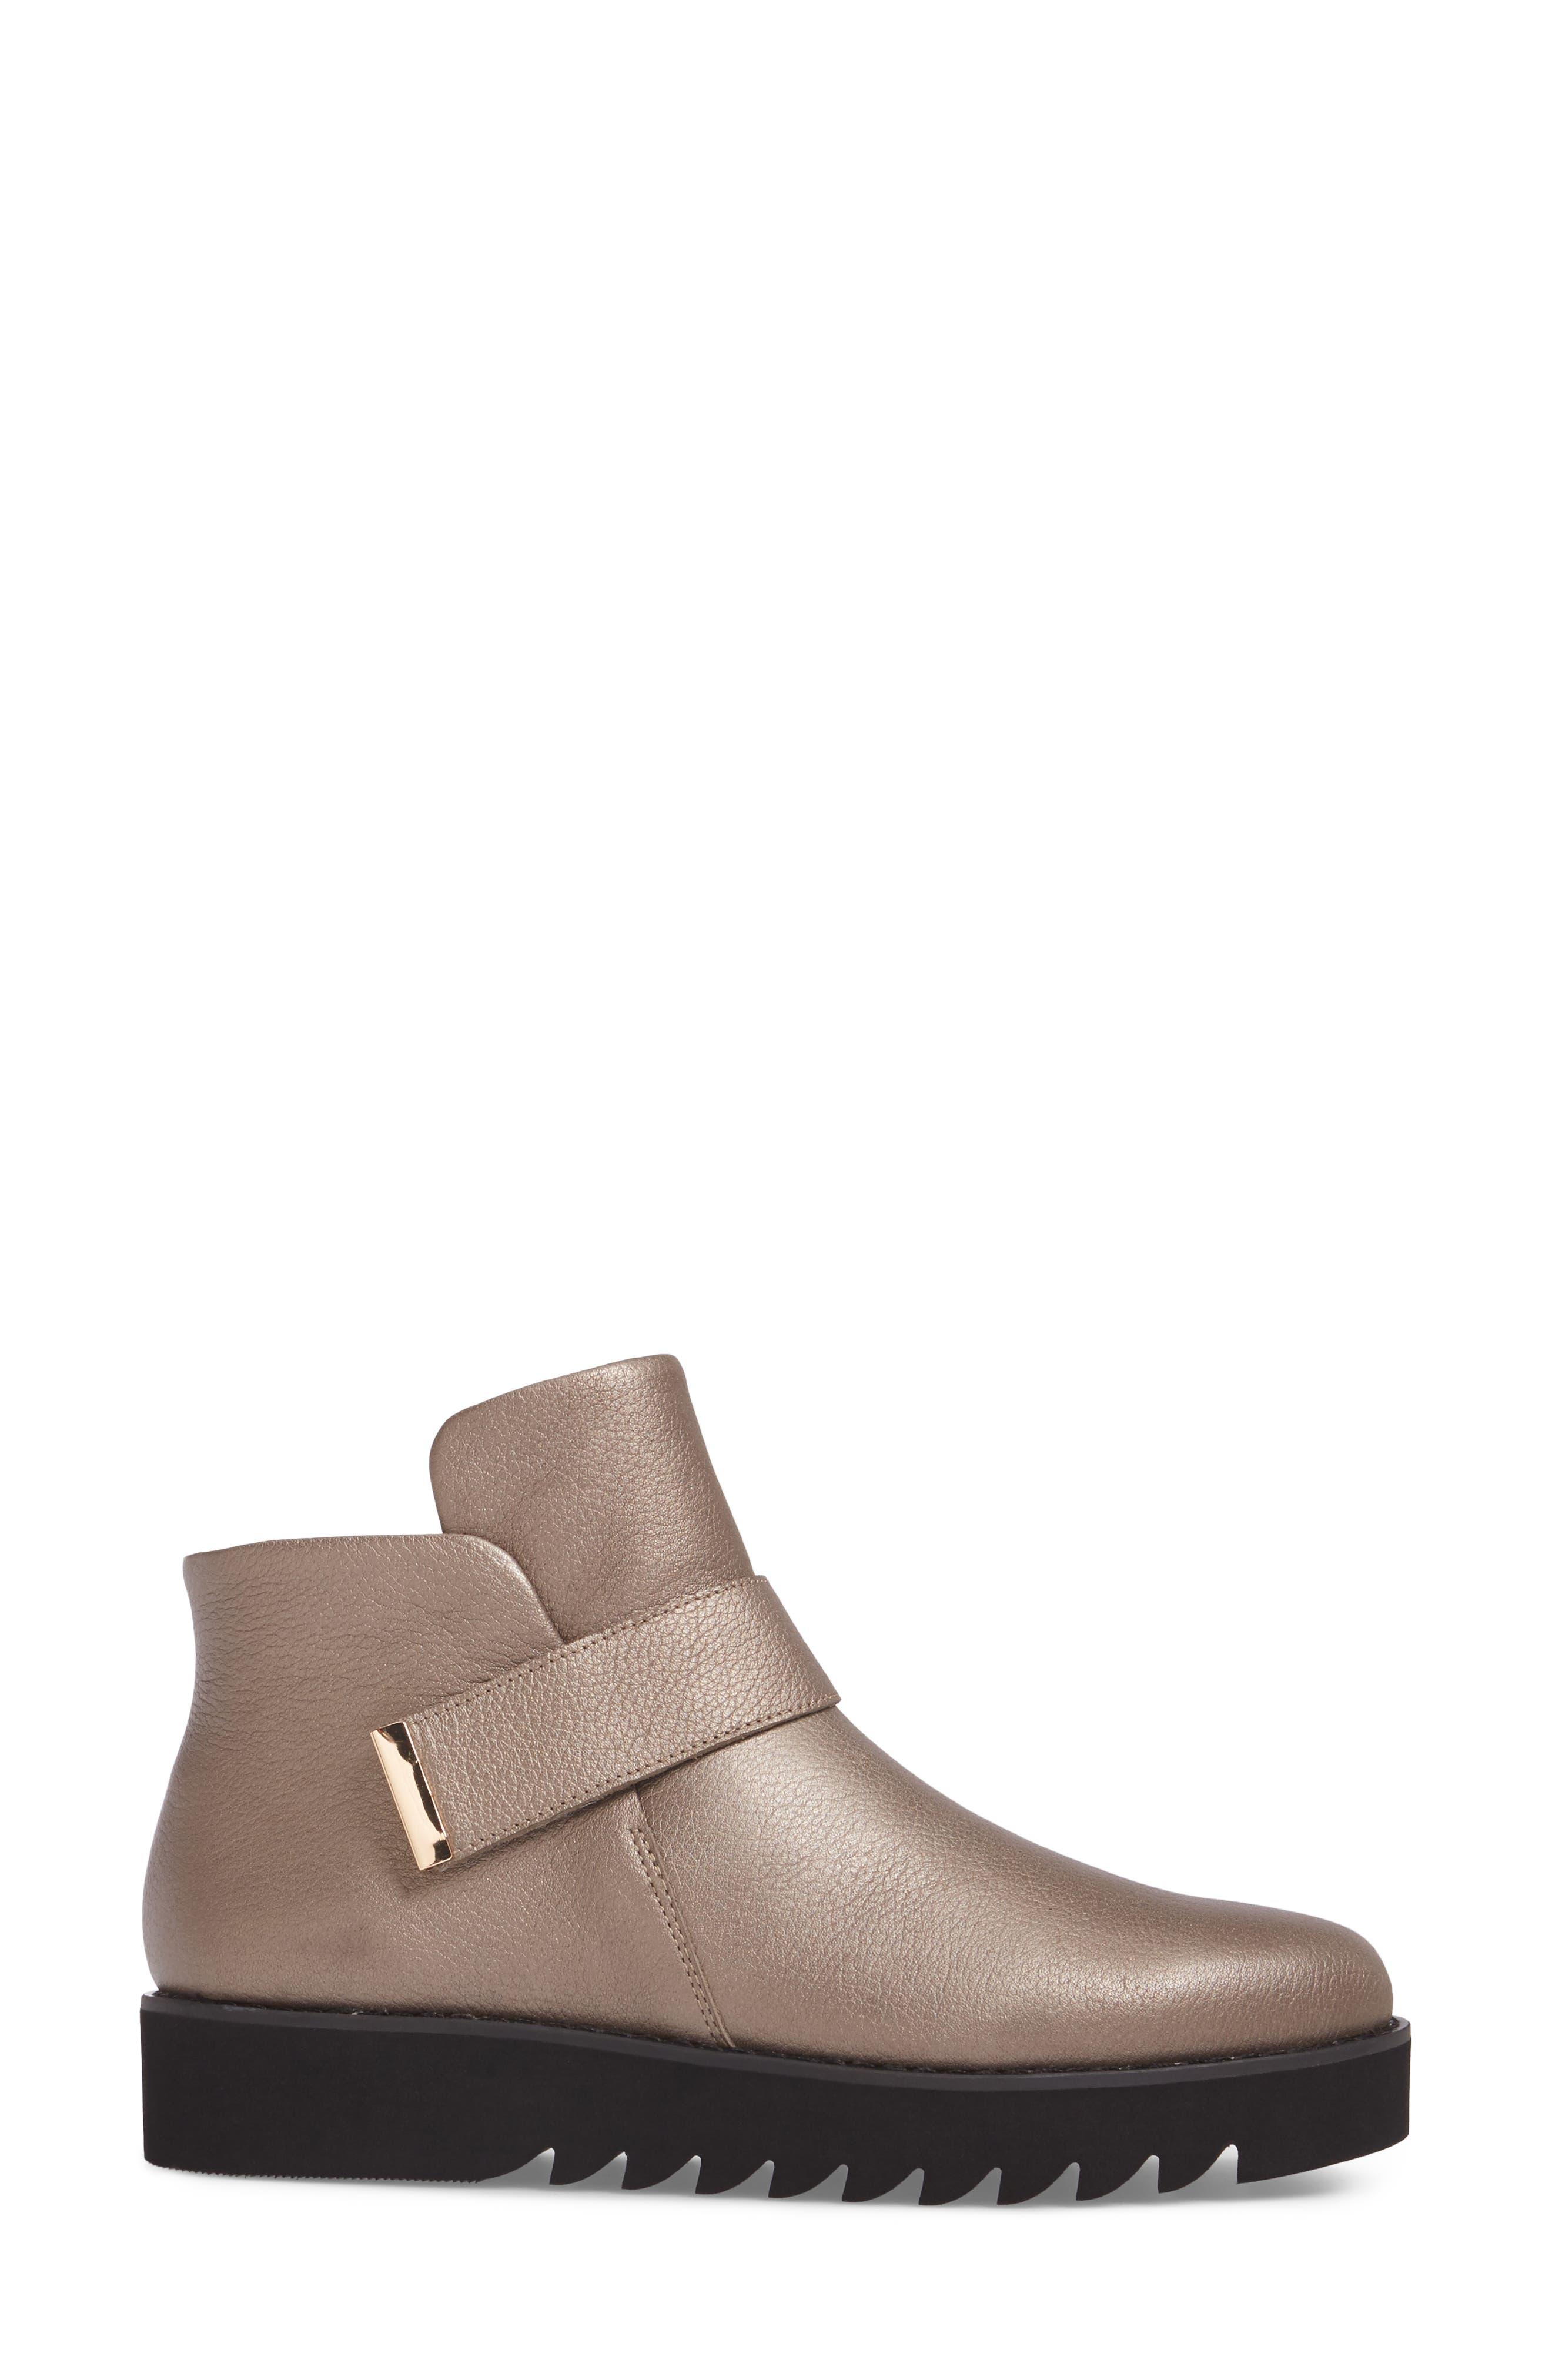 Kris Boot,                             Alternate thumbnail 3, color,                             Copper Leather